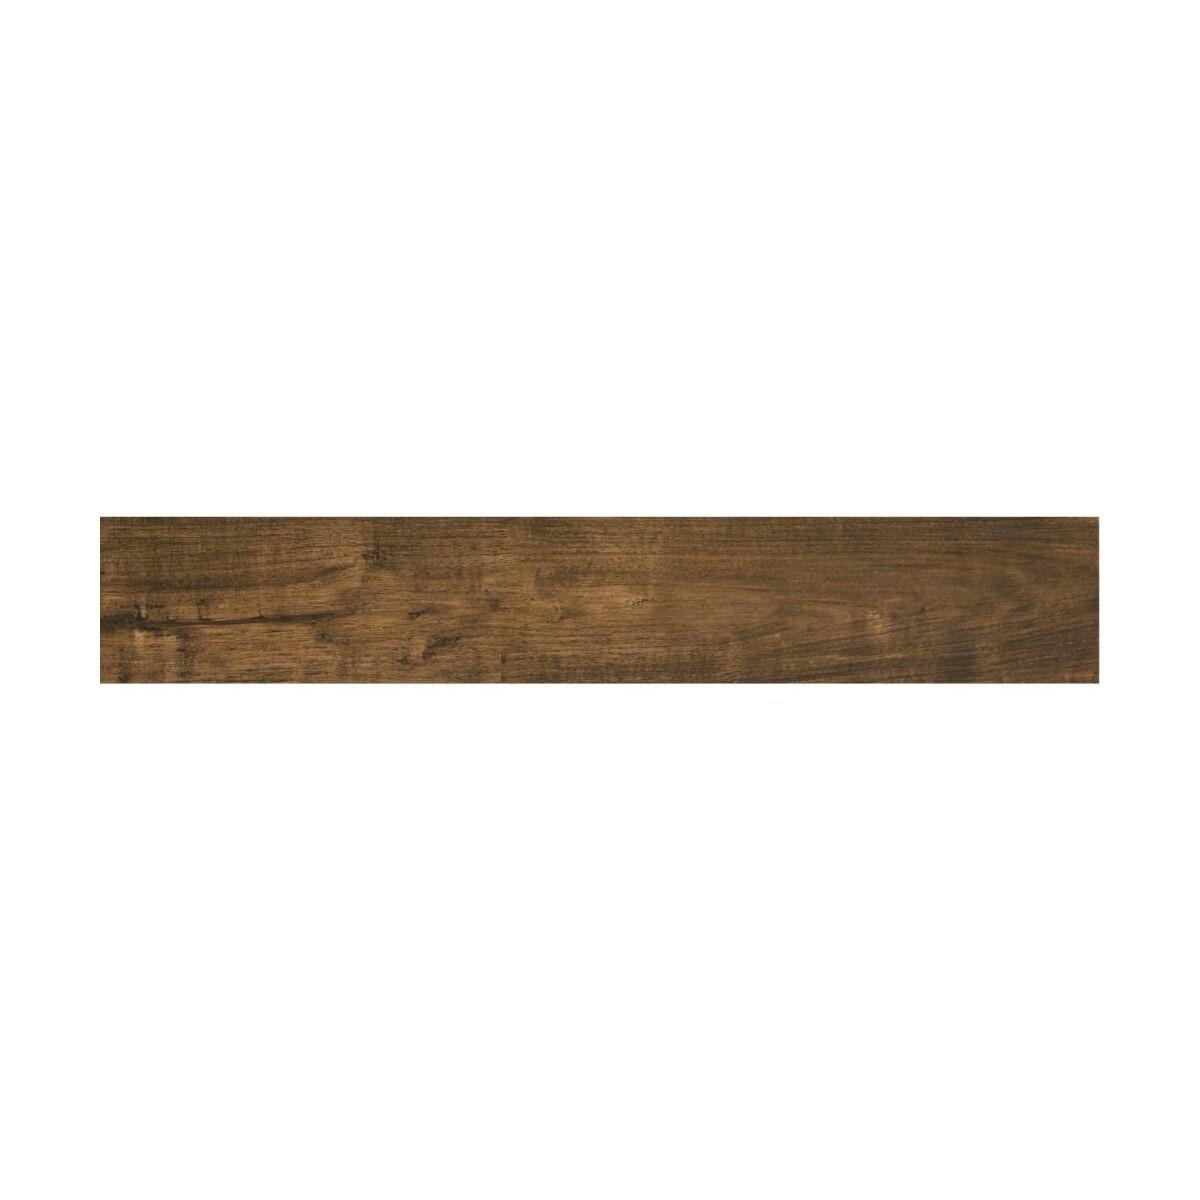 terakota porto sprawd opinie w leroy merlin. Black Bedroom Furniture Sets. Home Design Ideas